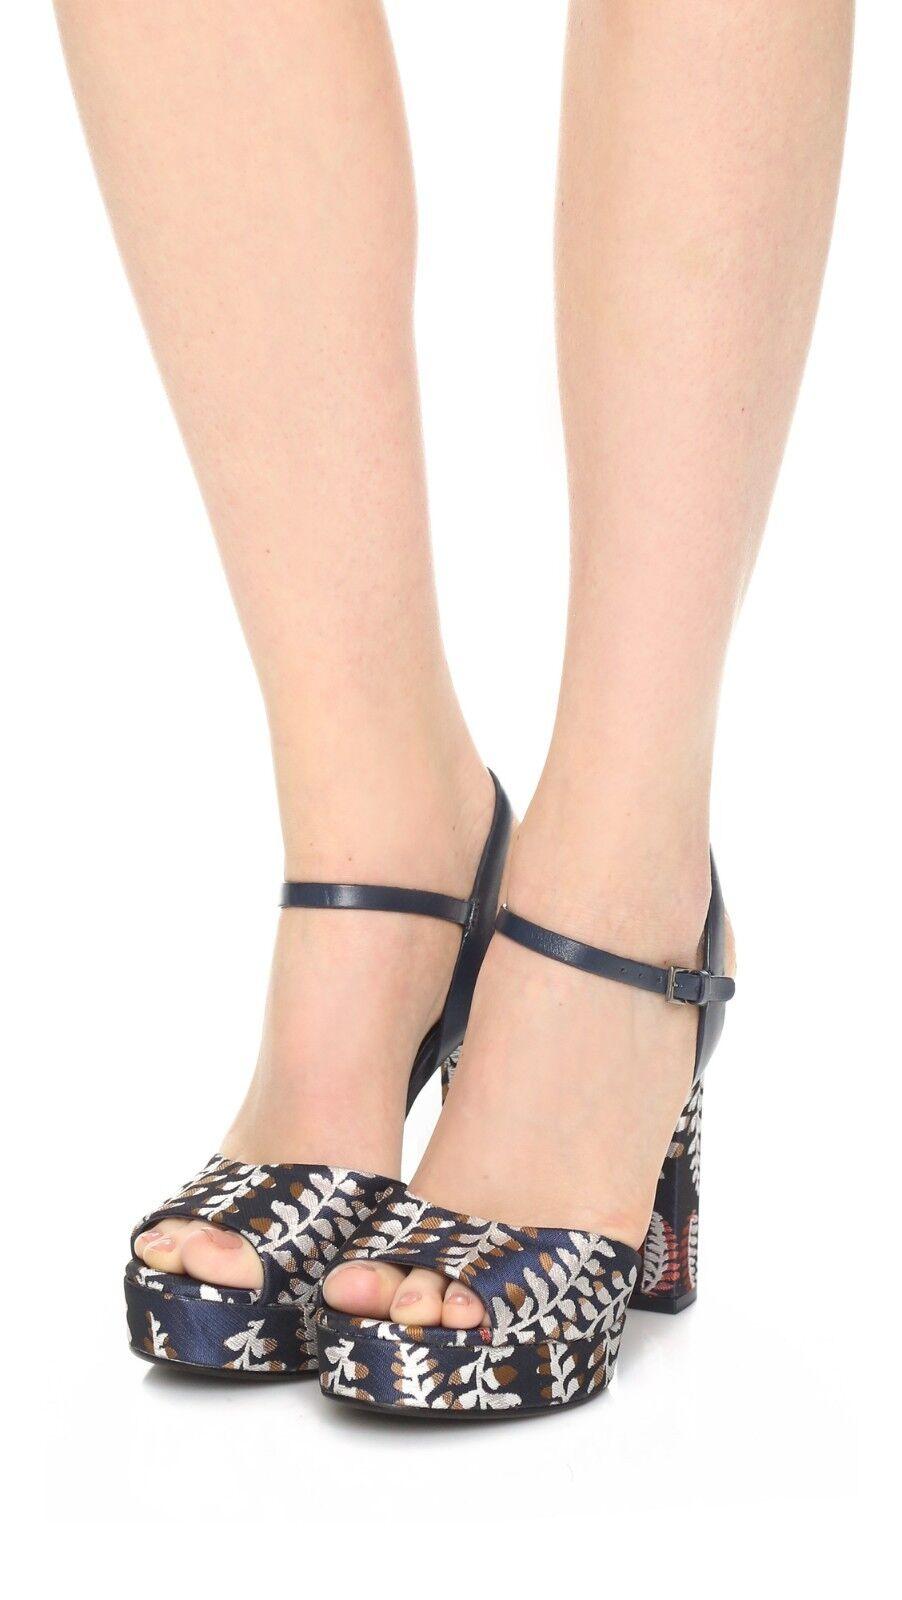 $395 NEW Tory Burch SOLANA Sandals 9 Jacquard Navy Ankle Strap Platform schuhes 9 Sandals 677da7